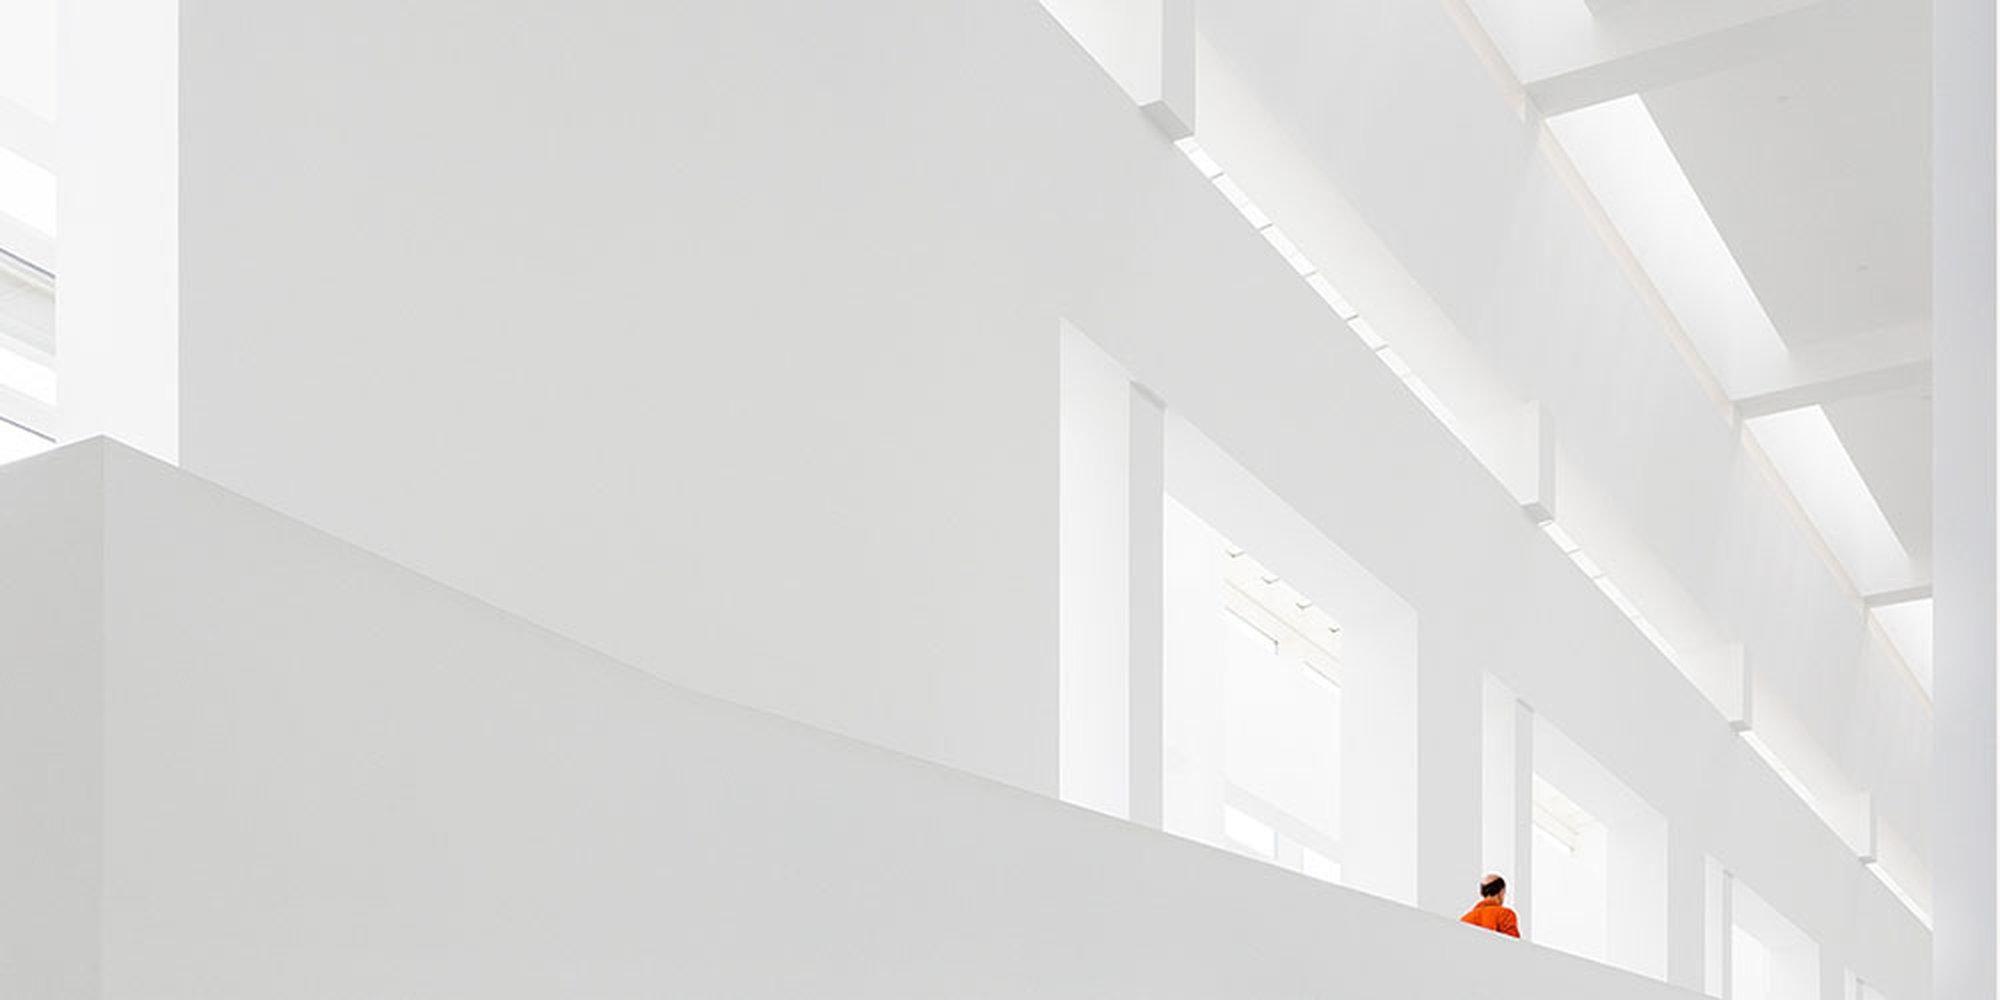 Minimalist art: will it work in my home?